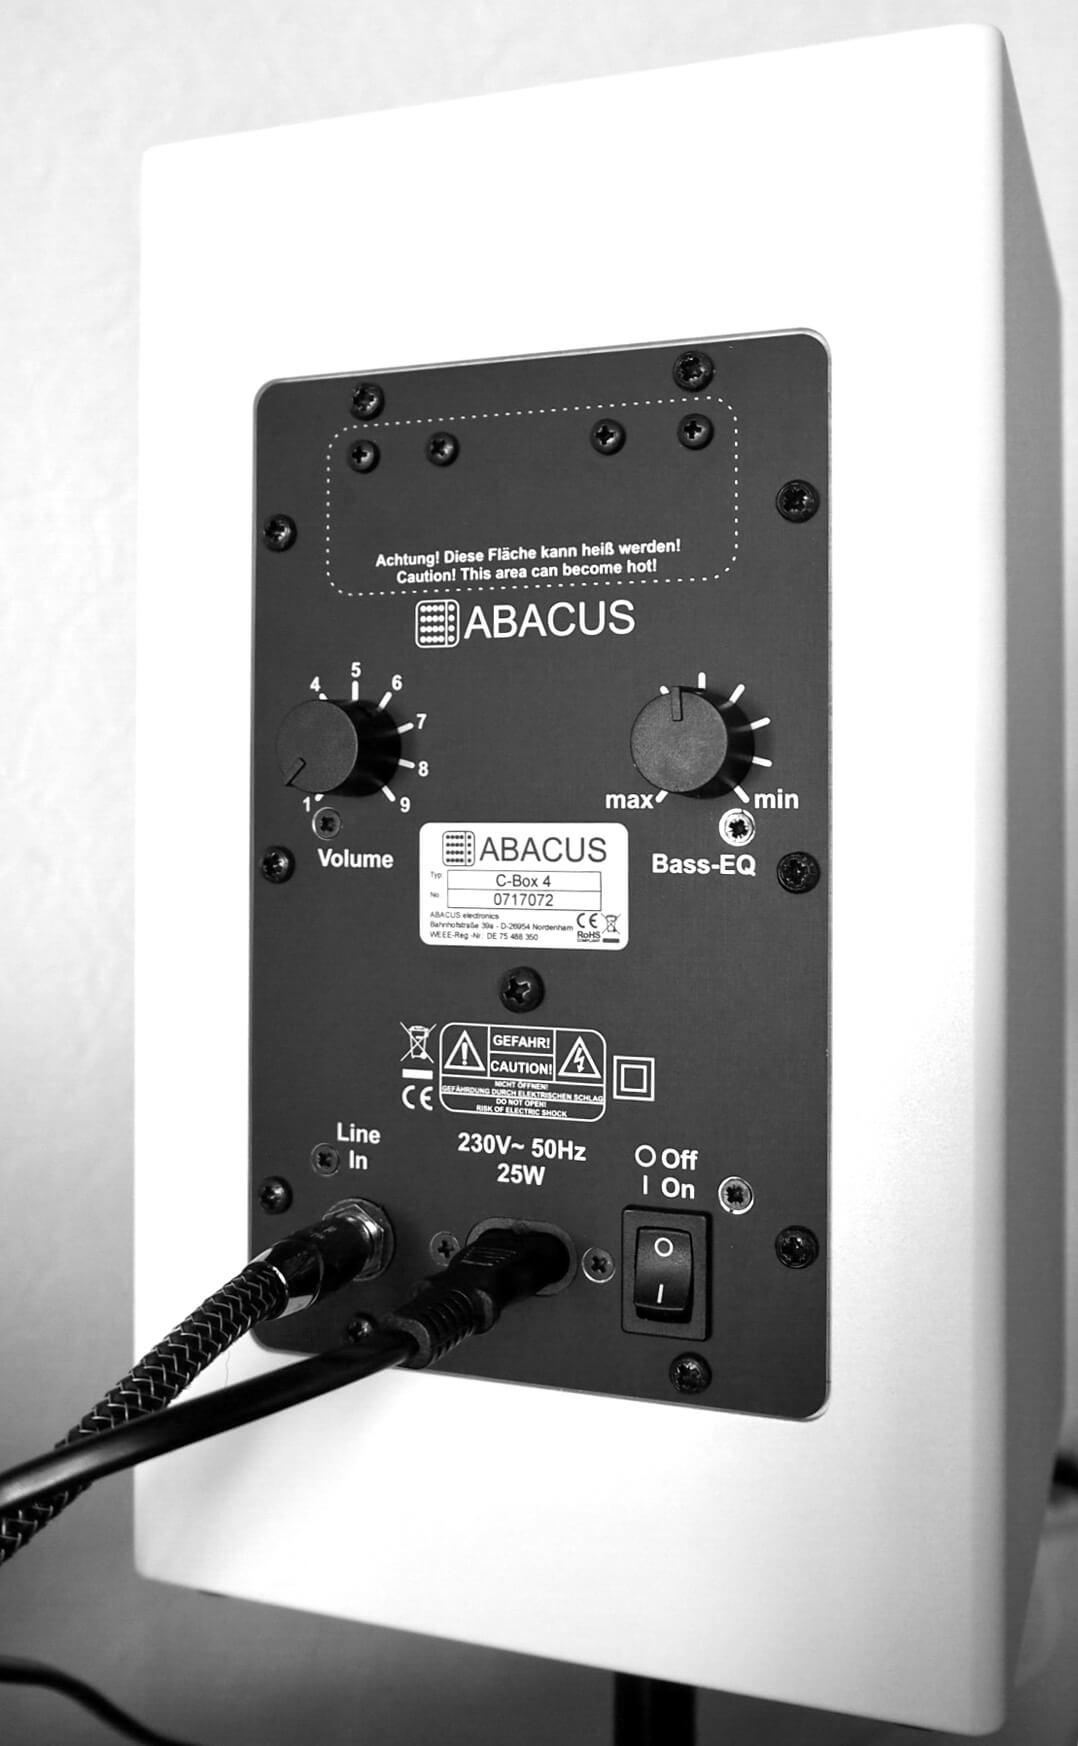 Abacus C-Box 4 Rückseite/Anschlüsse